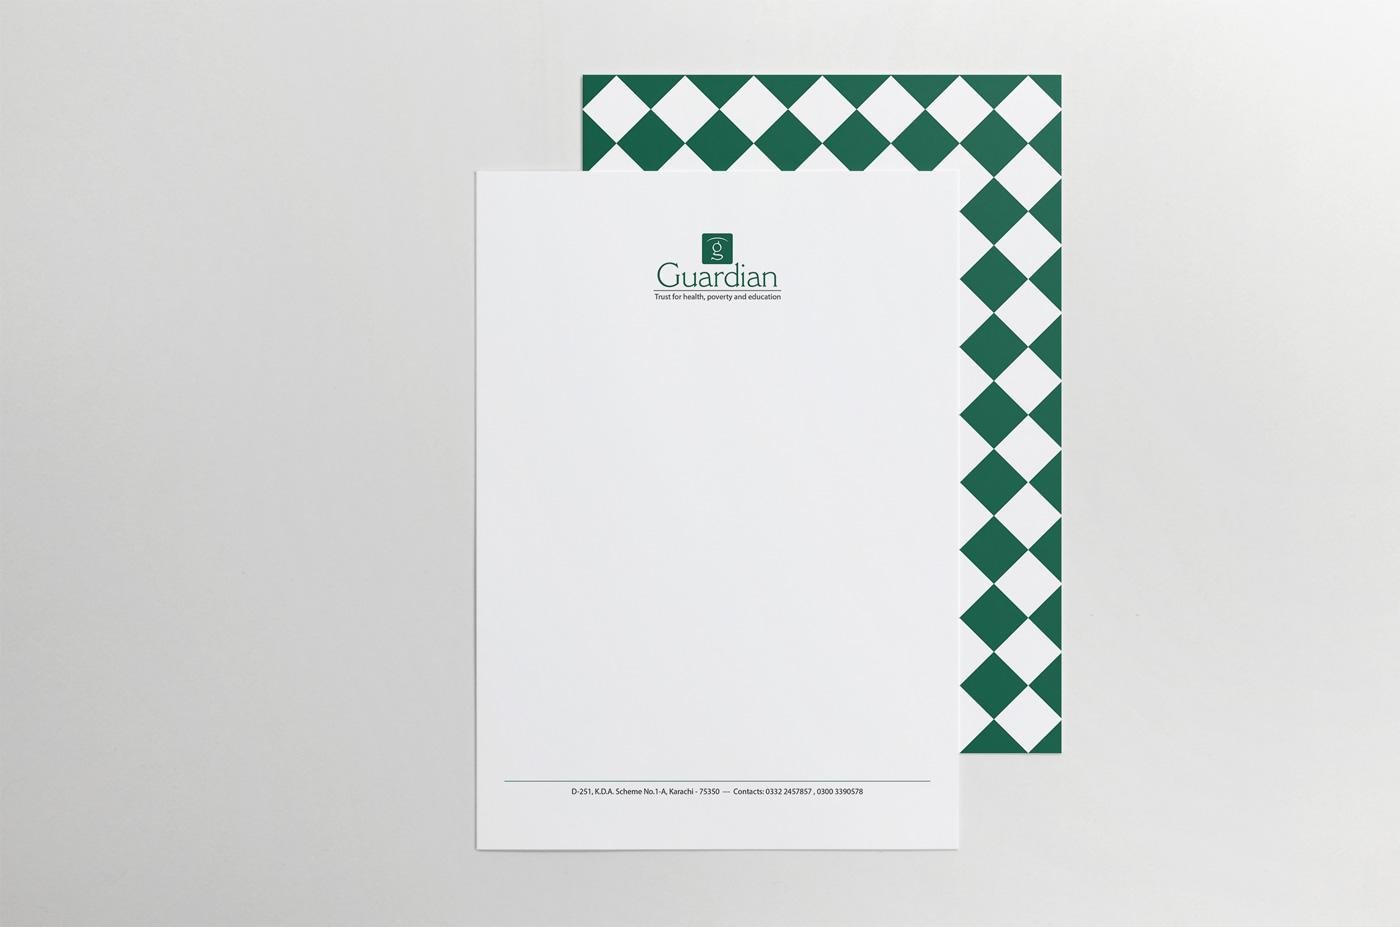 graphic design print letterhead guardian trust Education children Health